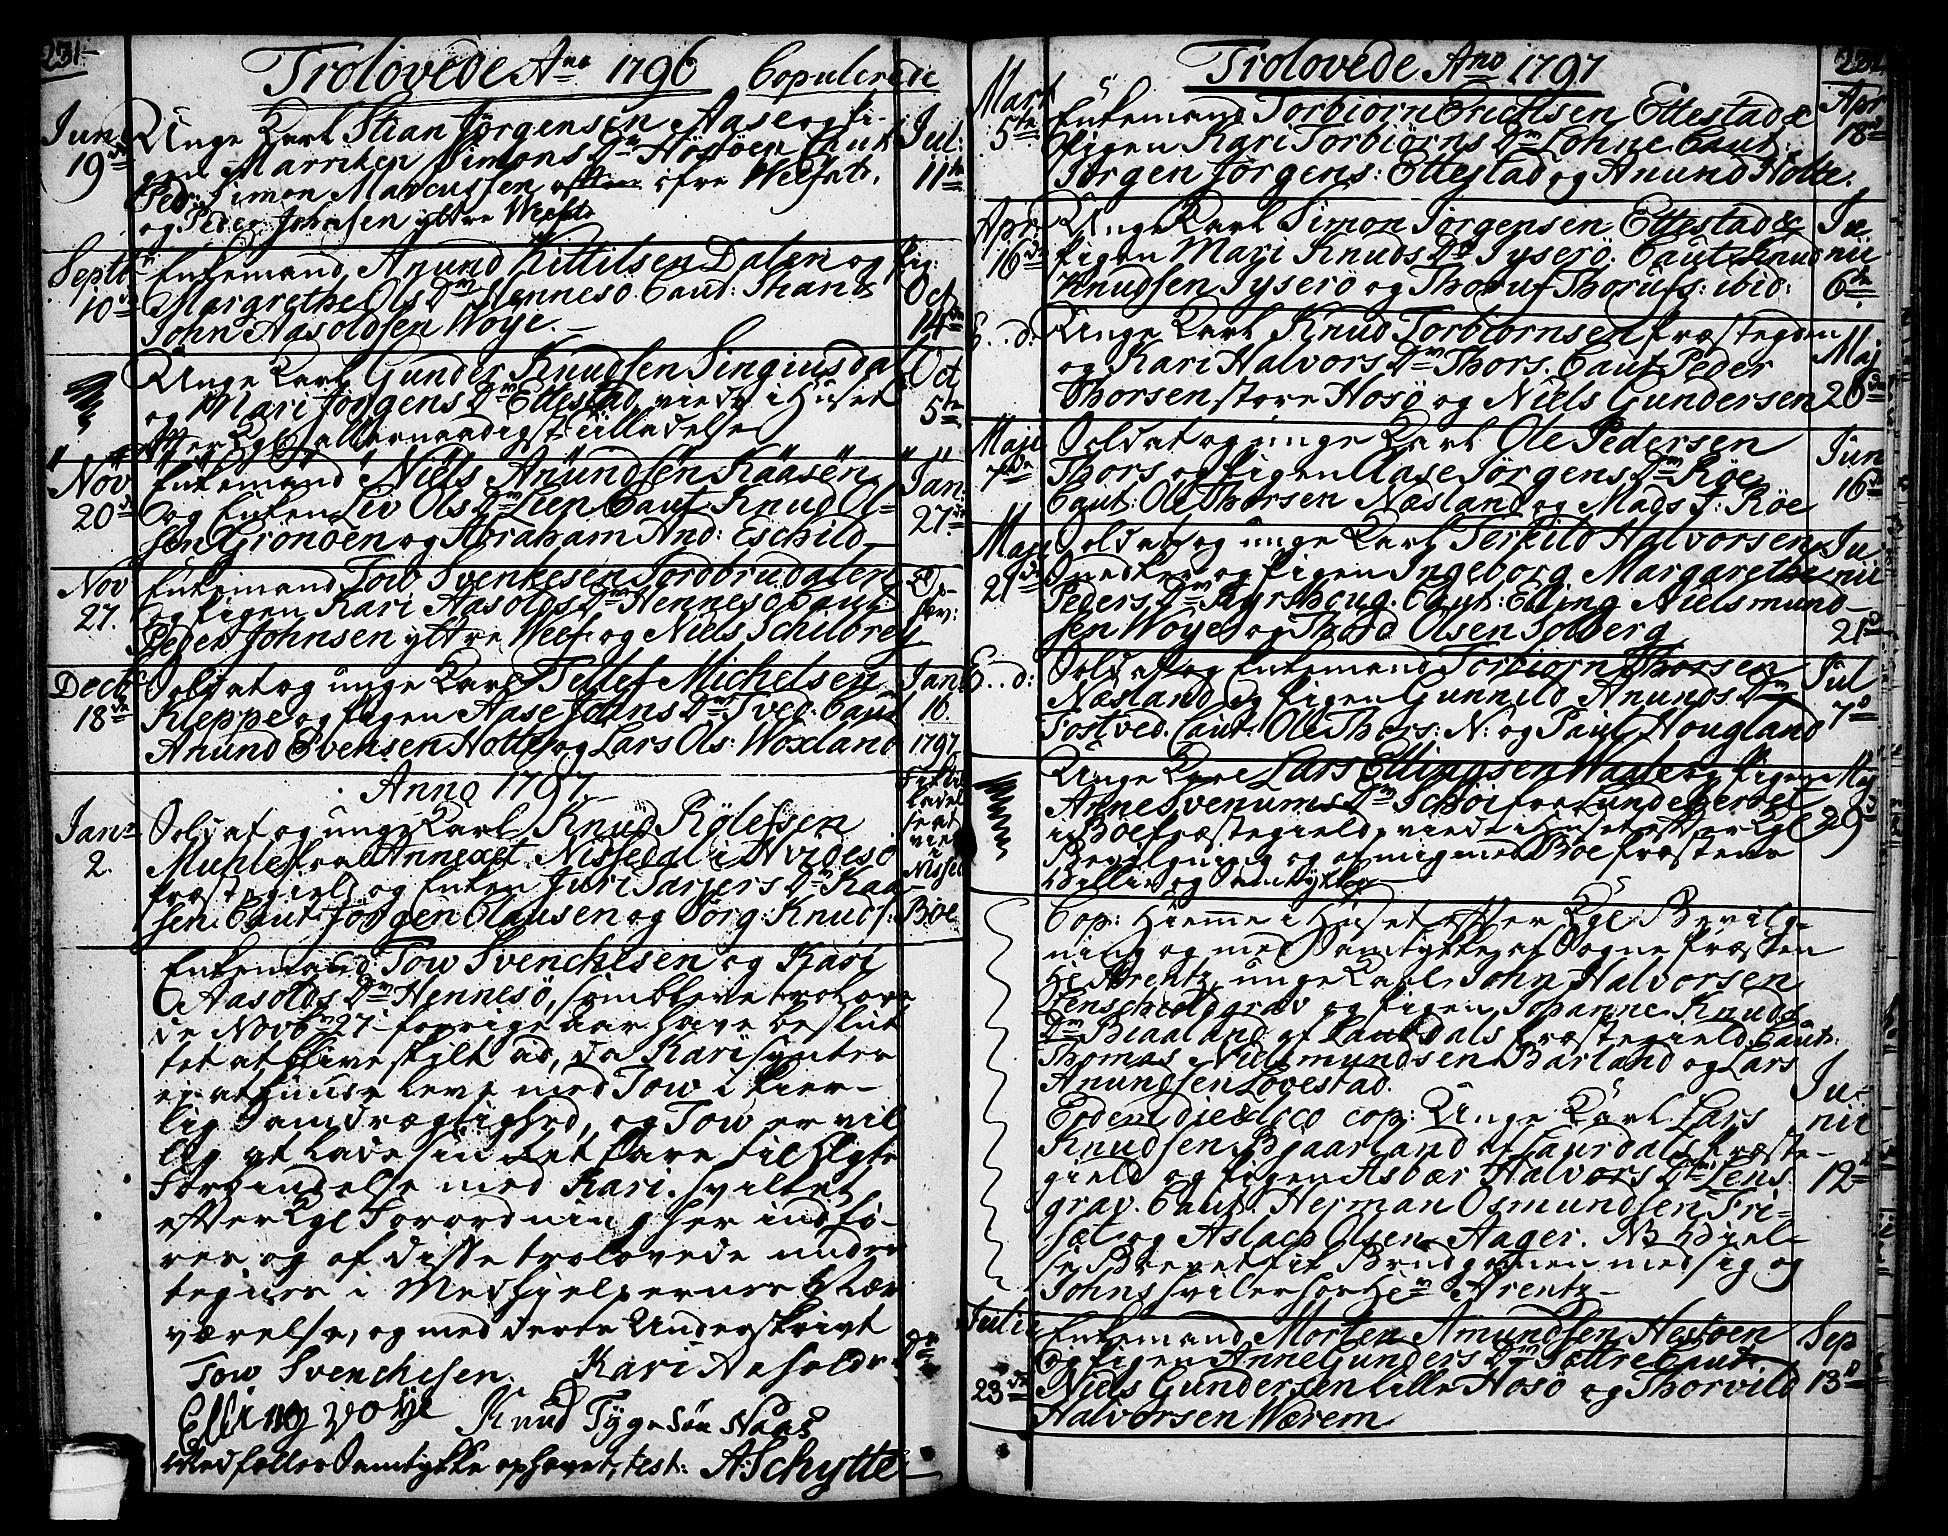 SAKO, Drangedal kirkebøker, F/Fa/L0003: Ministerialbok nr. 3, 1768-1814, s. 231-232